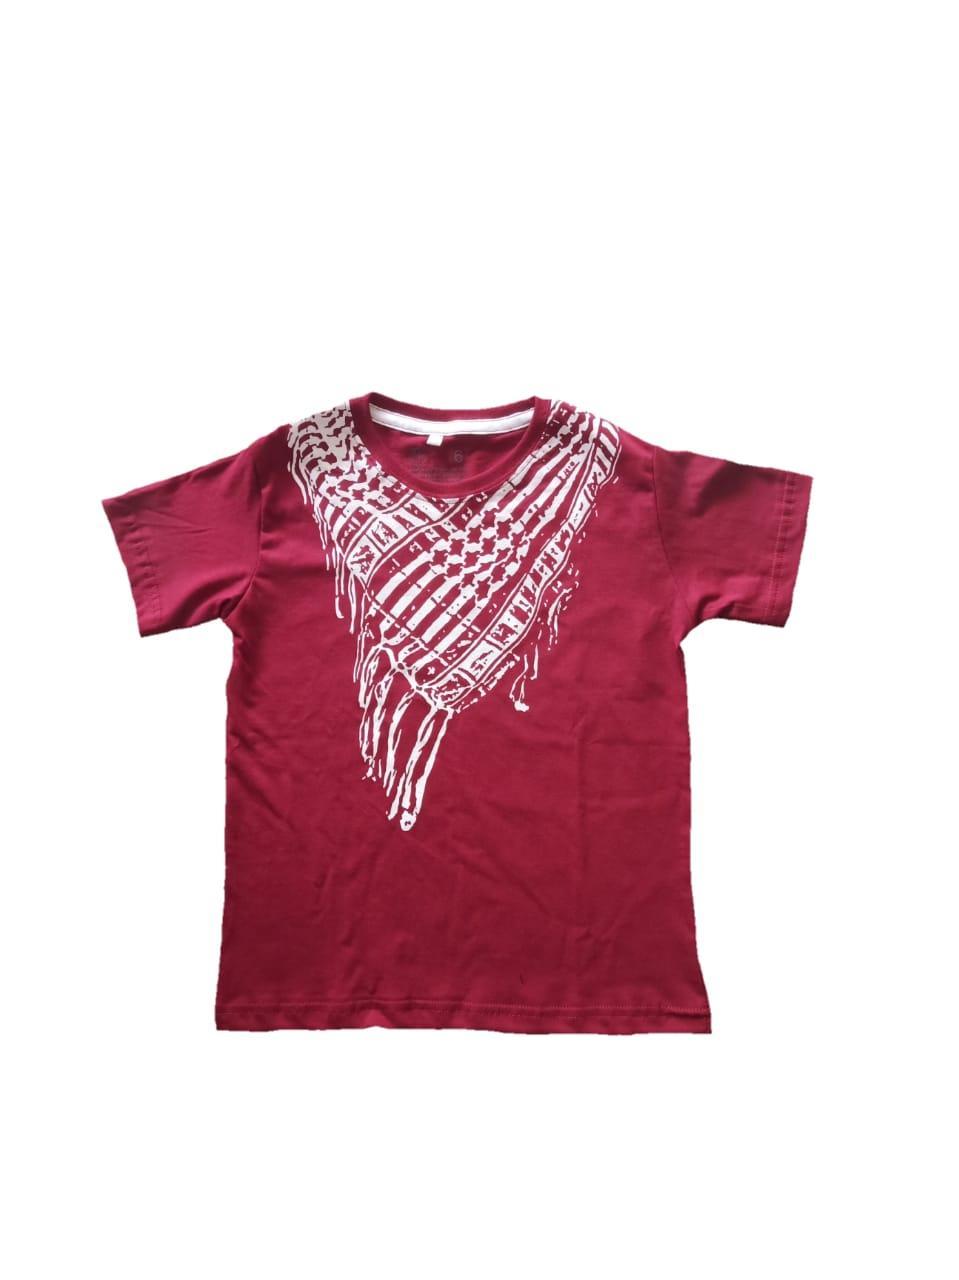 baju muslim anak laki - Membeli baju muslim anak laki